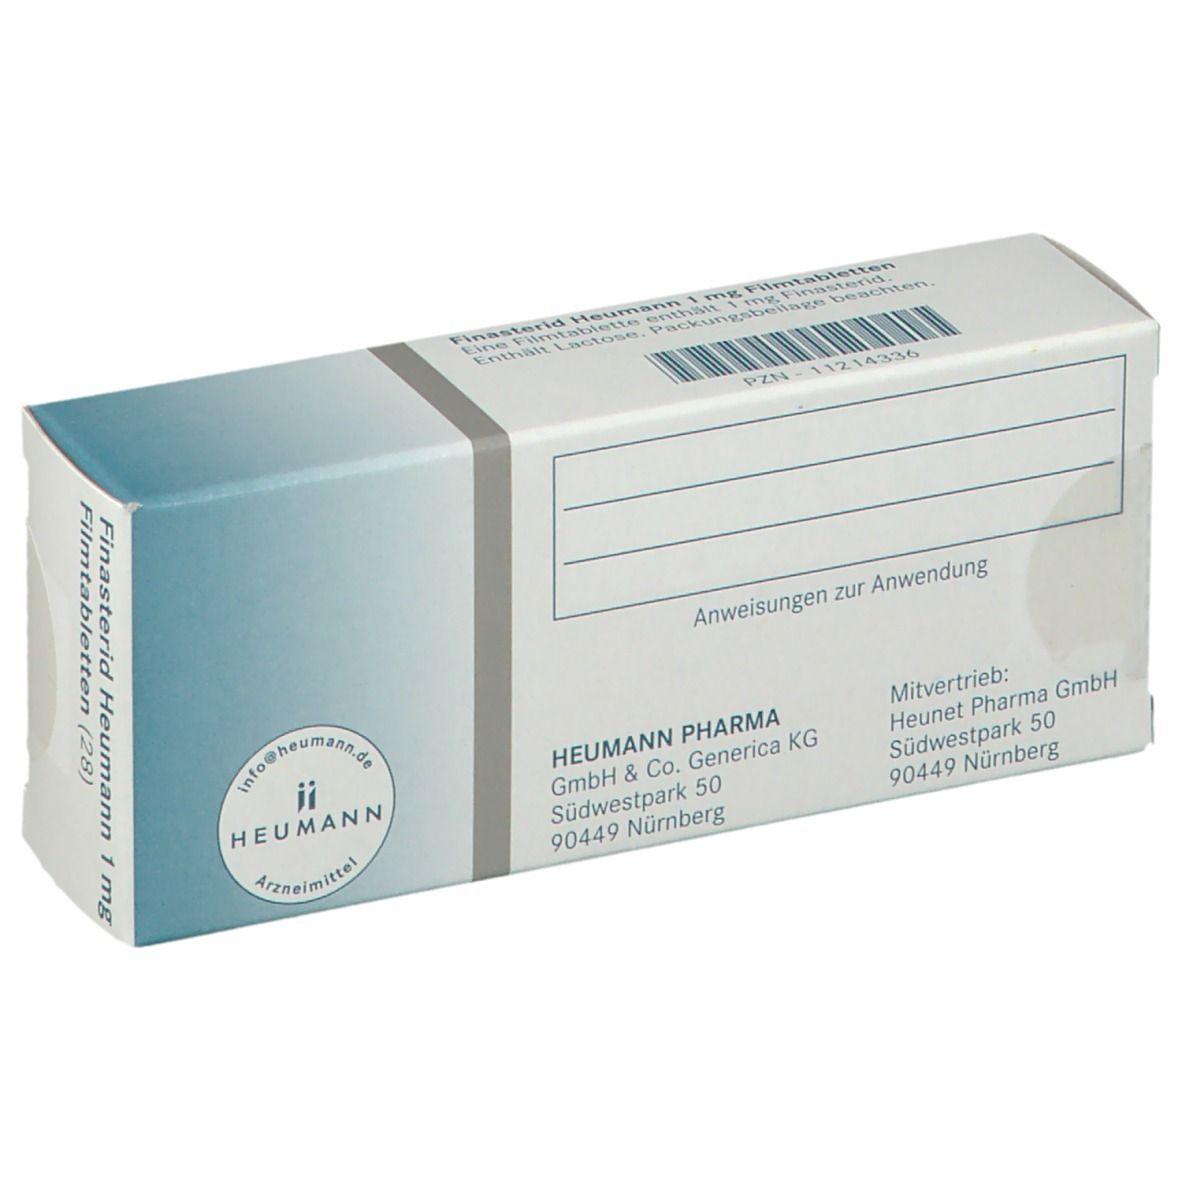 Finasterid Heumann 20 mg 20 St   shop apotheke.com